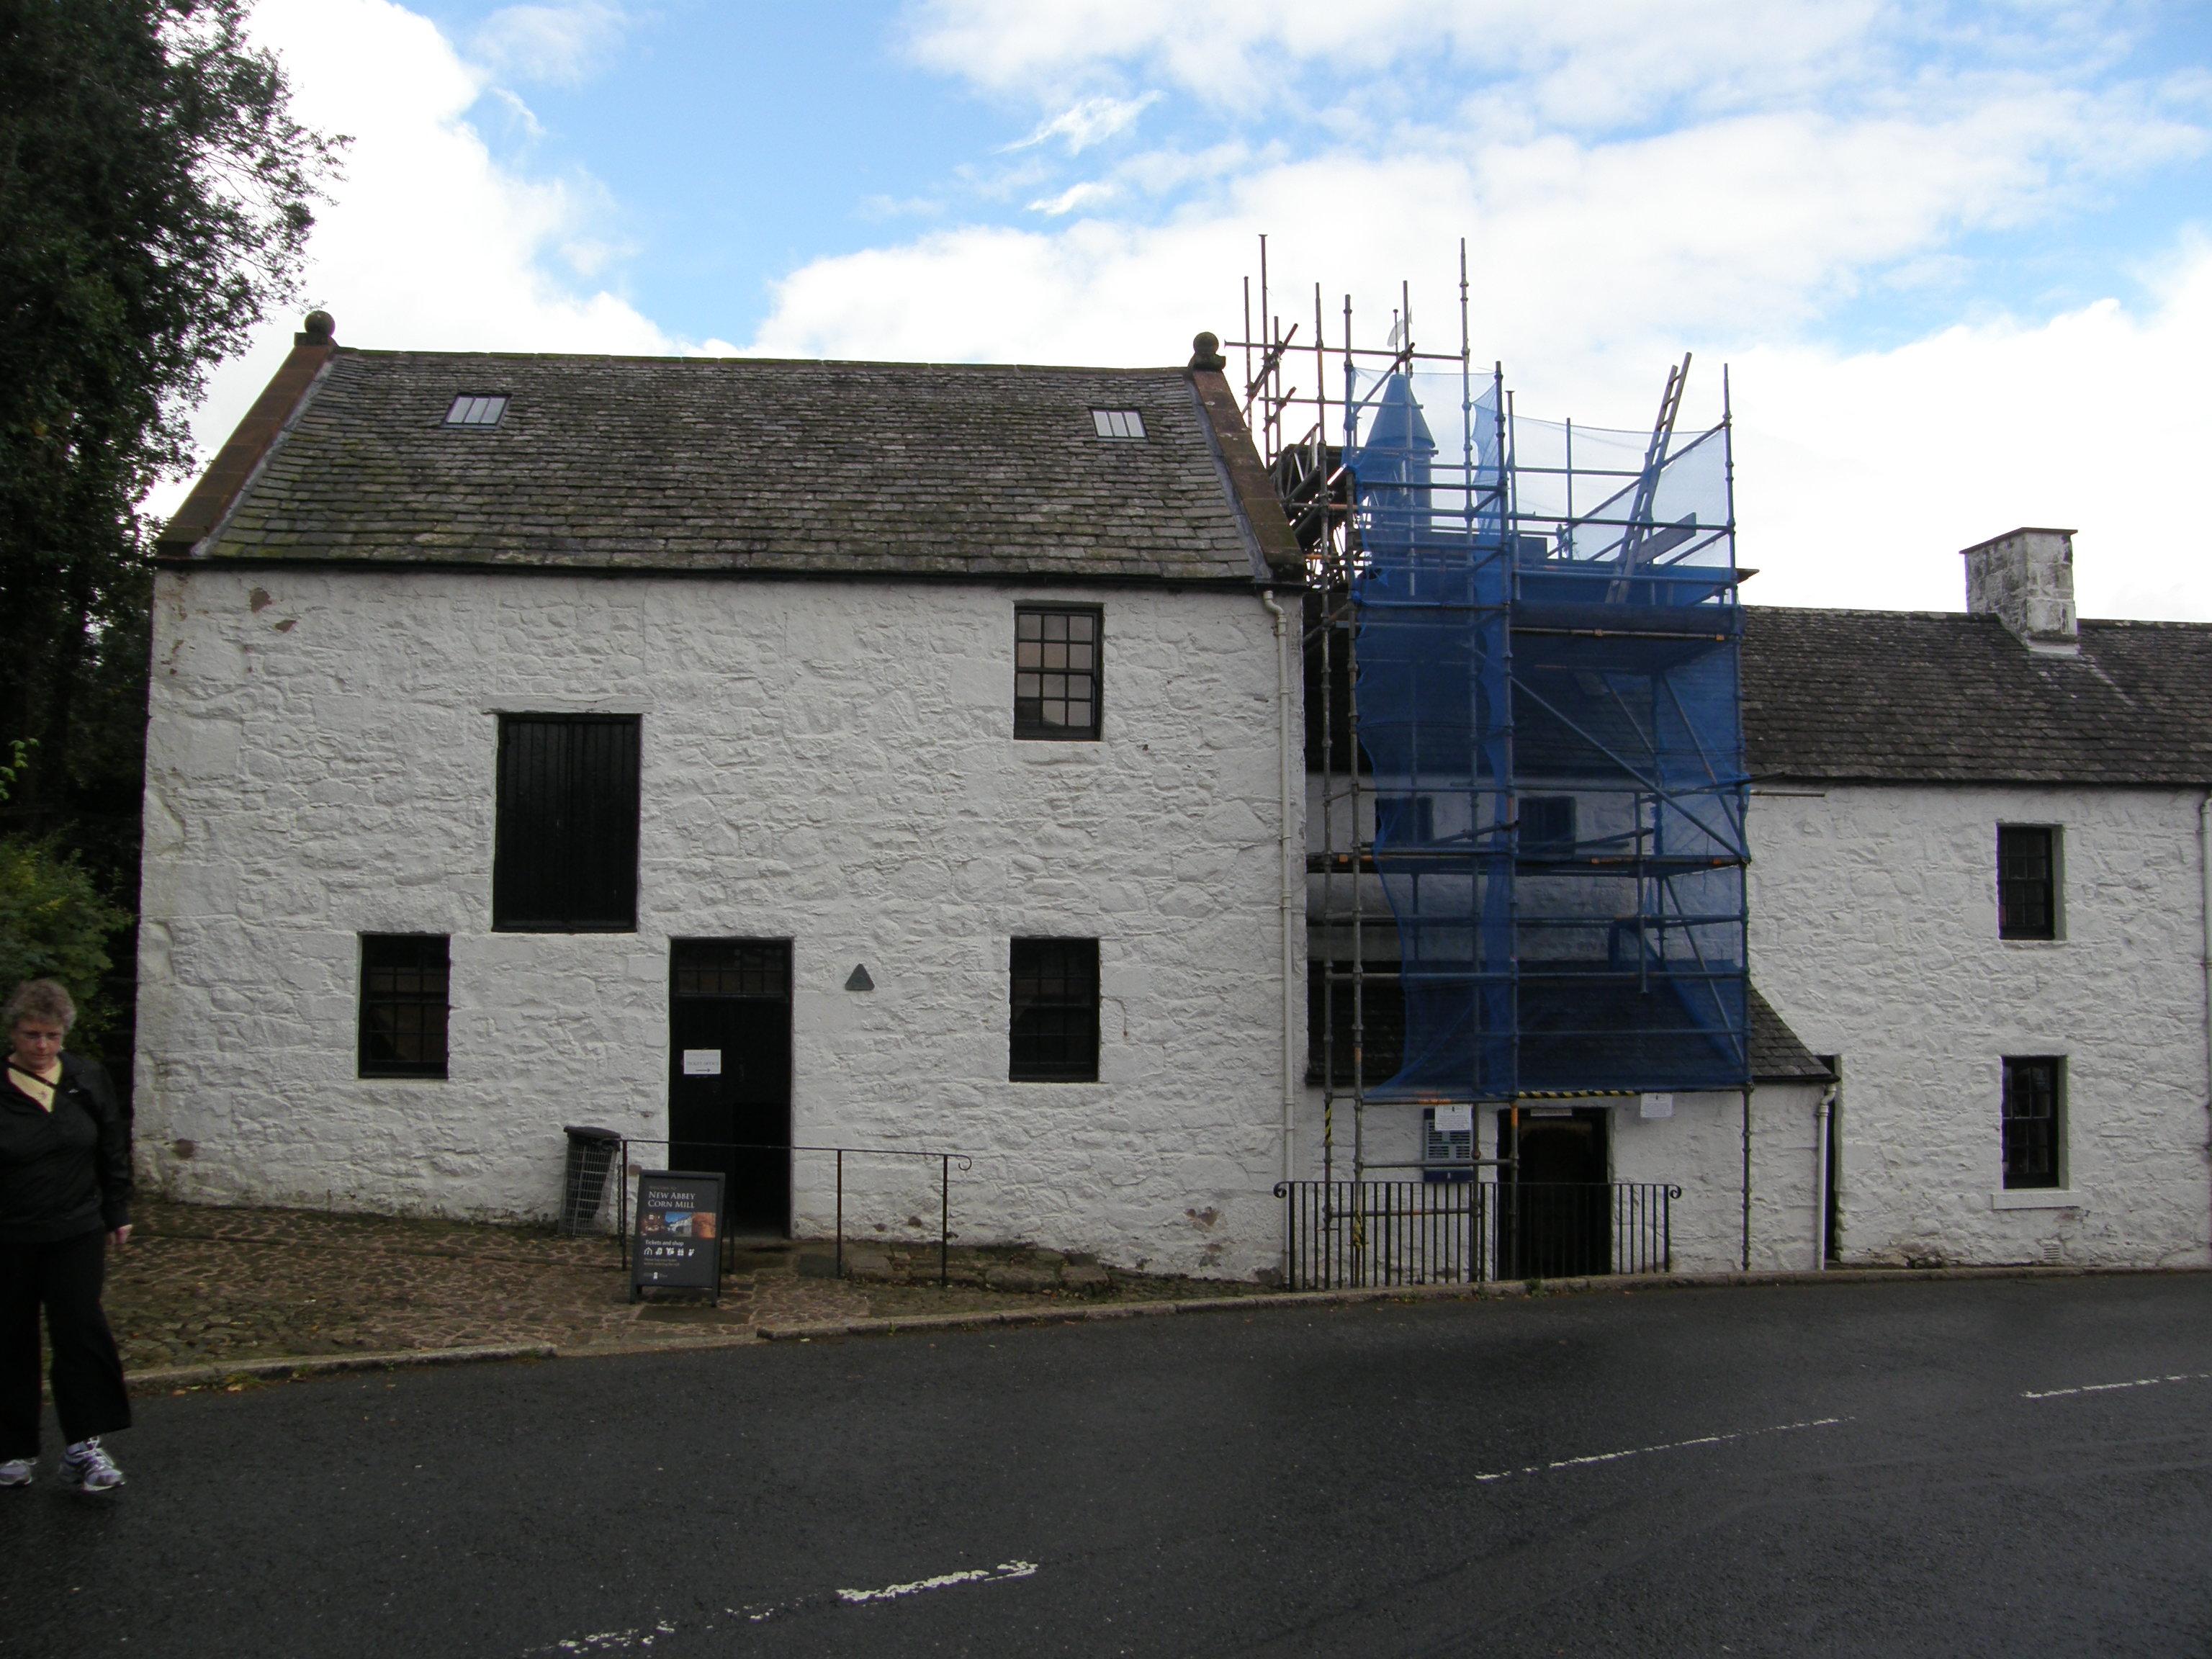 The New Abbey Corn Mill